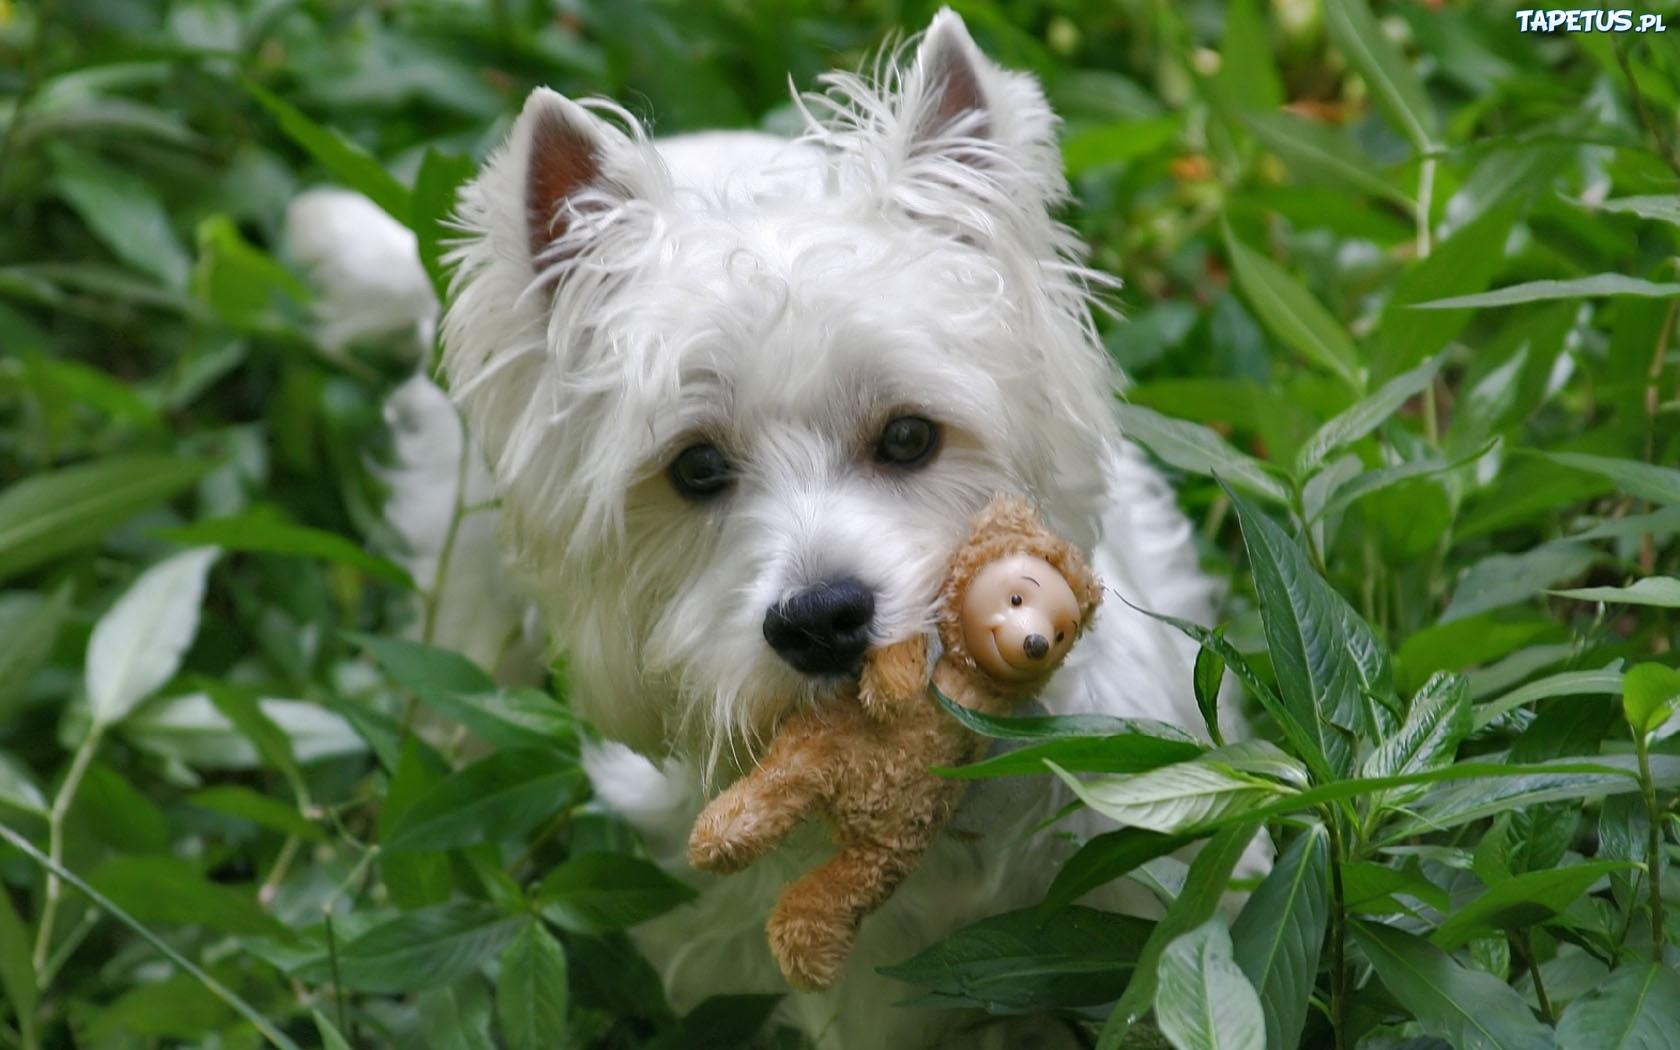 west highland white terrier - JungleKey.fr Image #250